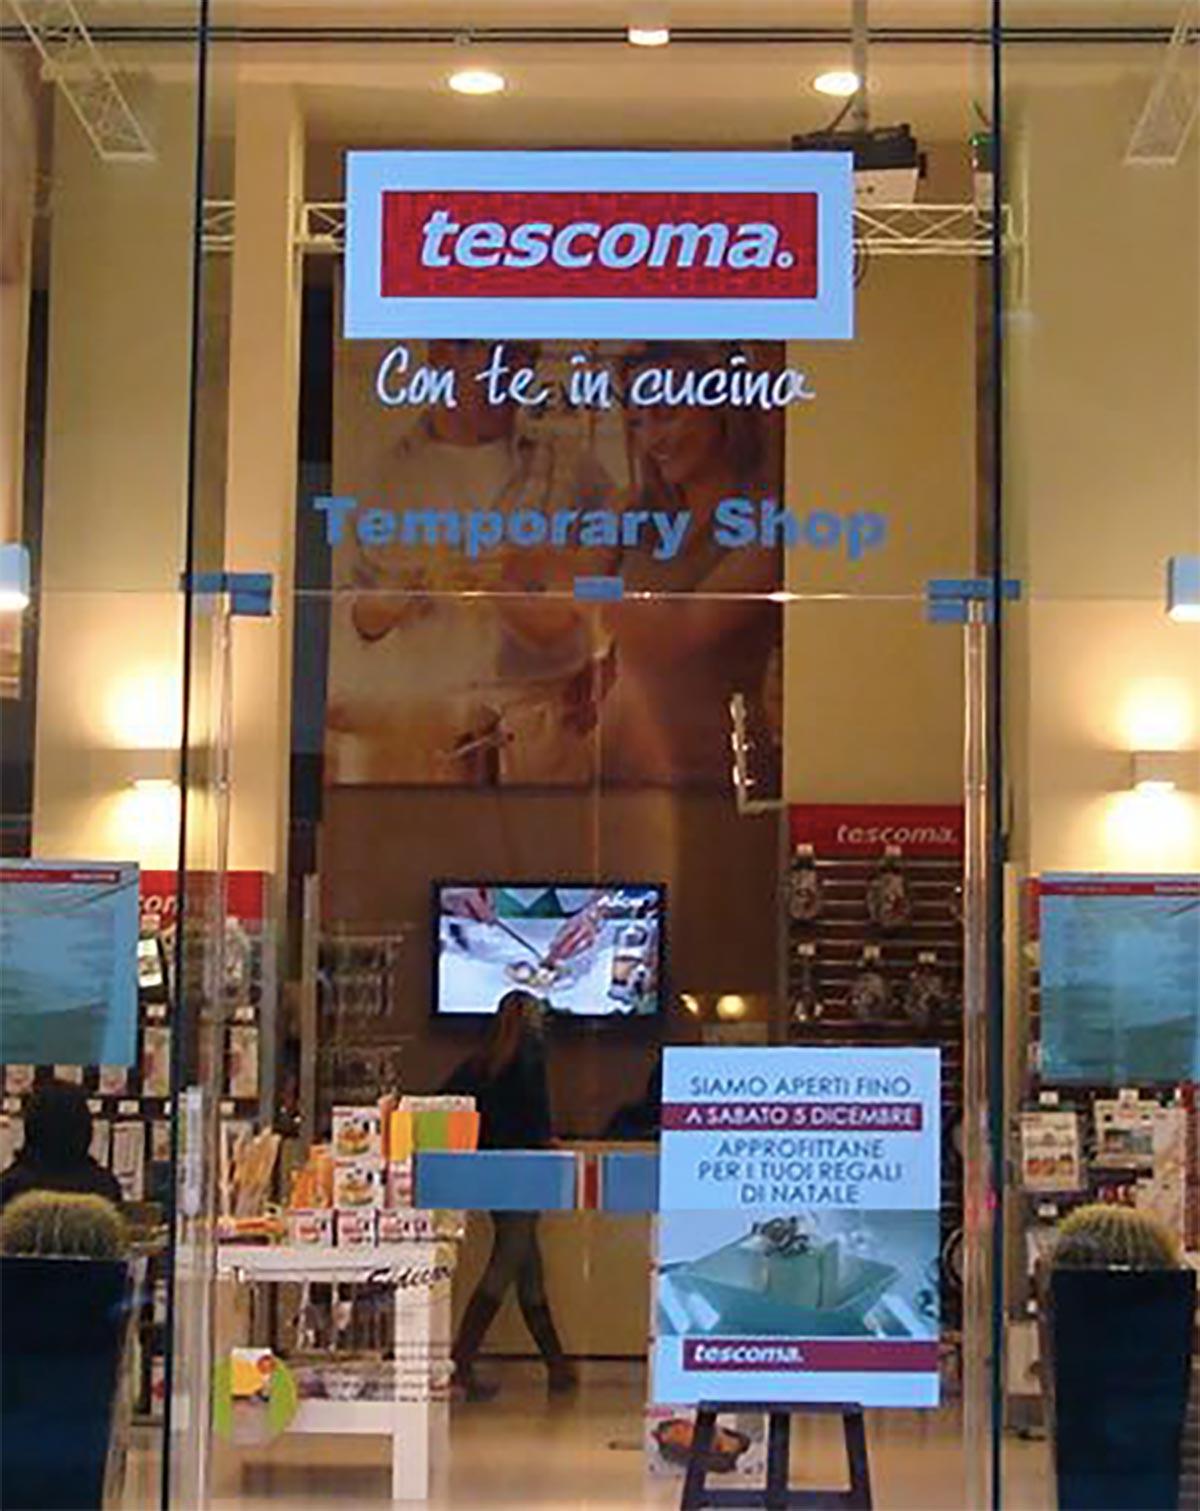 temporary-store-shop-milano-corso-garibaldi-evento-tescoma-pop-up-noleggio-utensili-casa-franchising